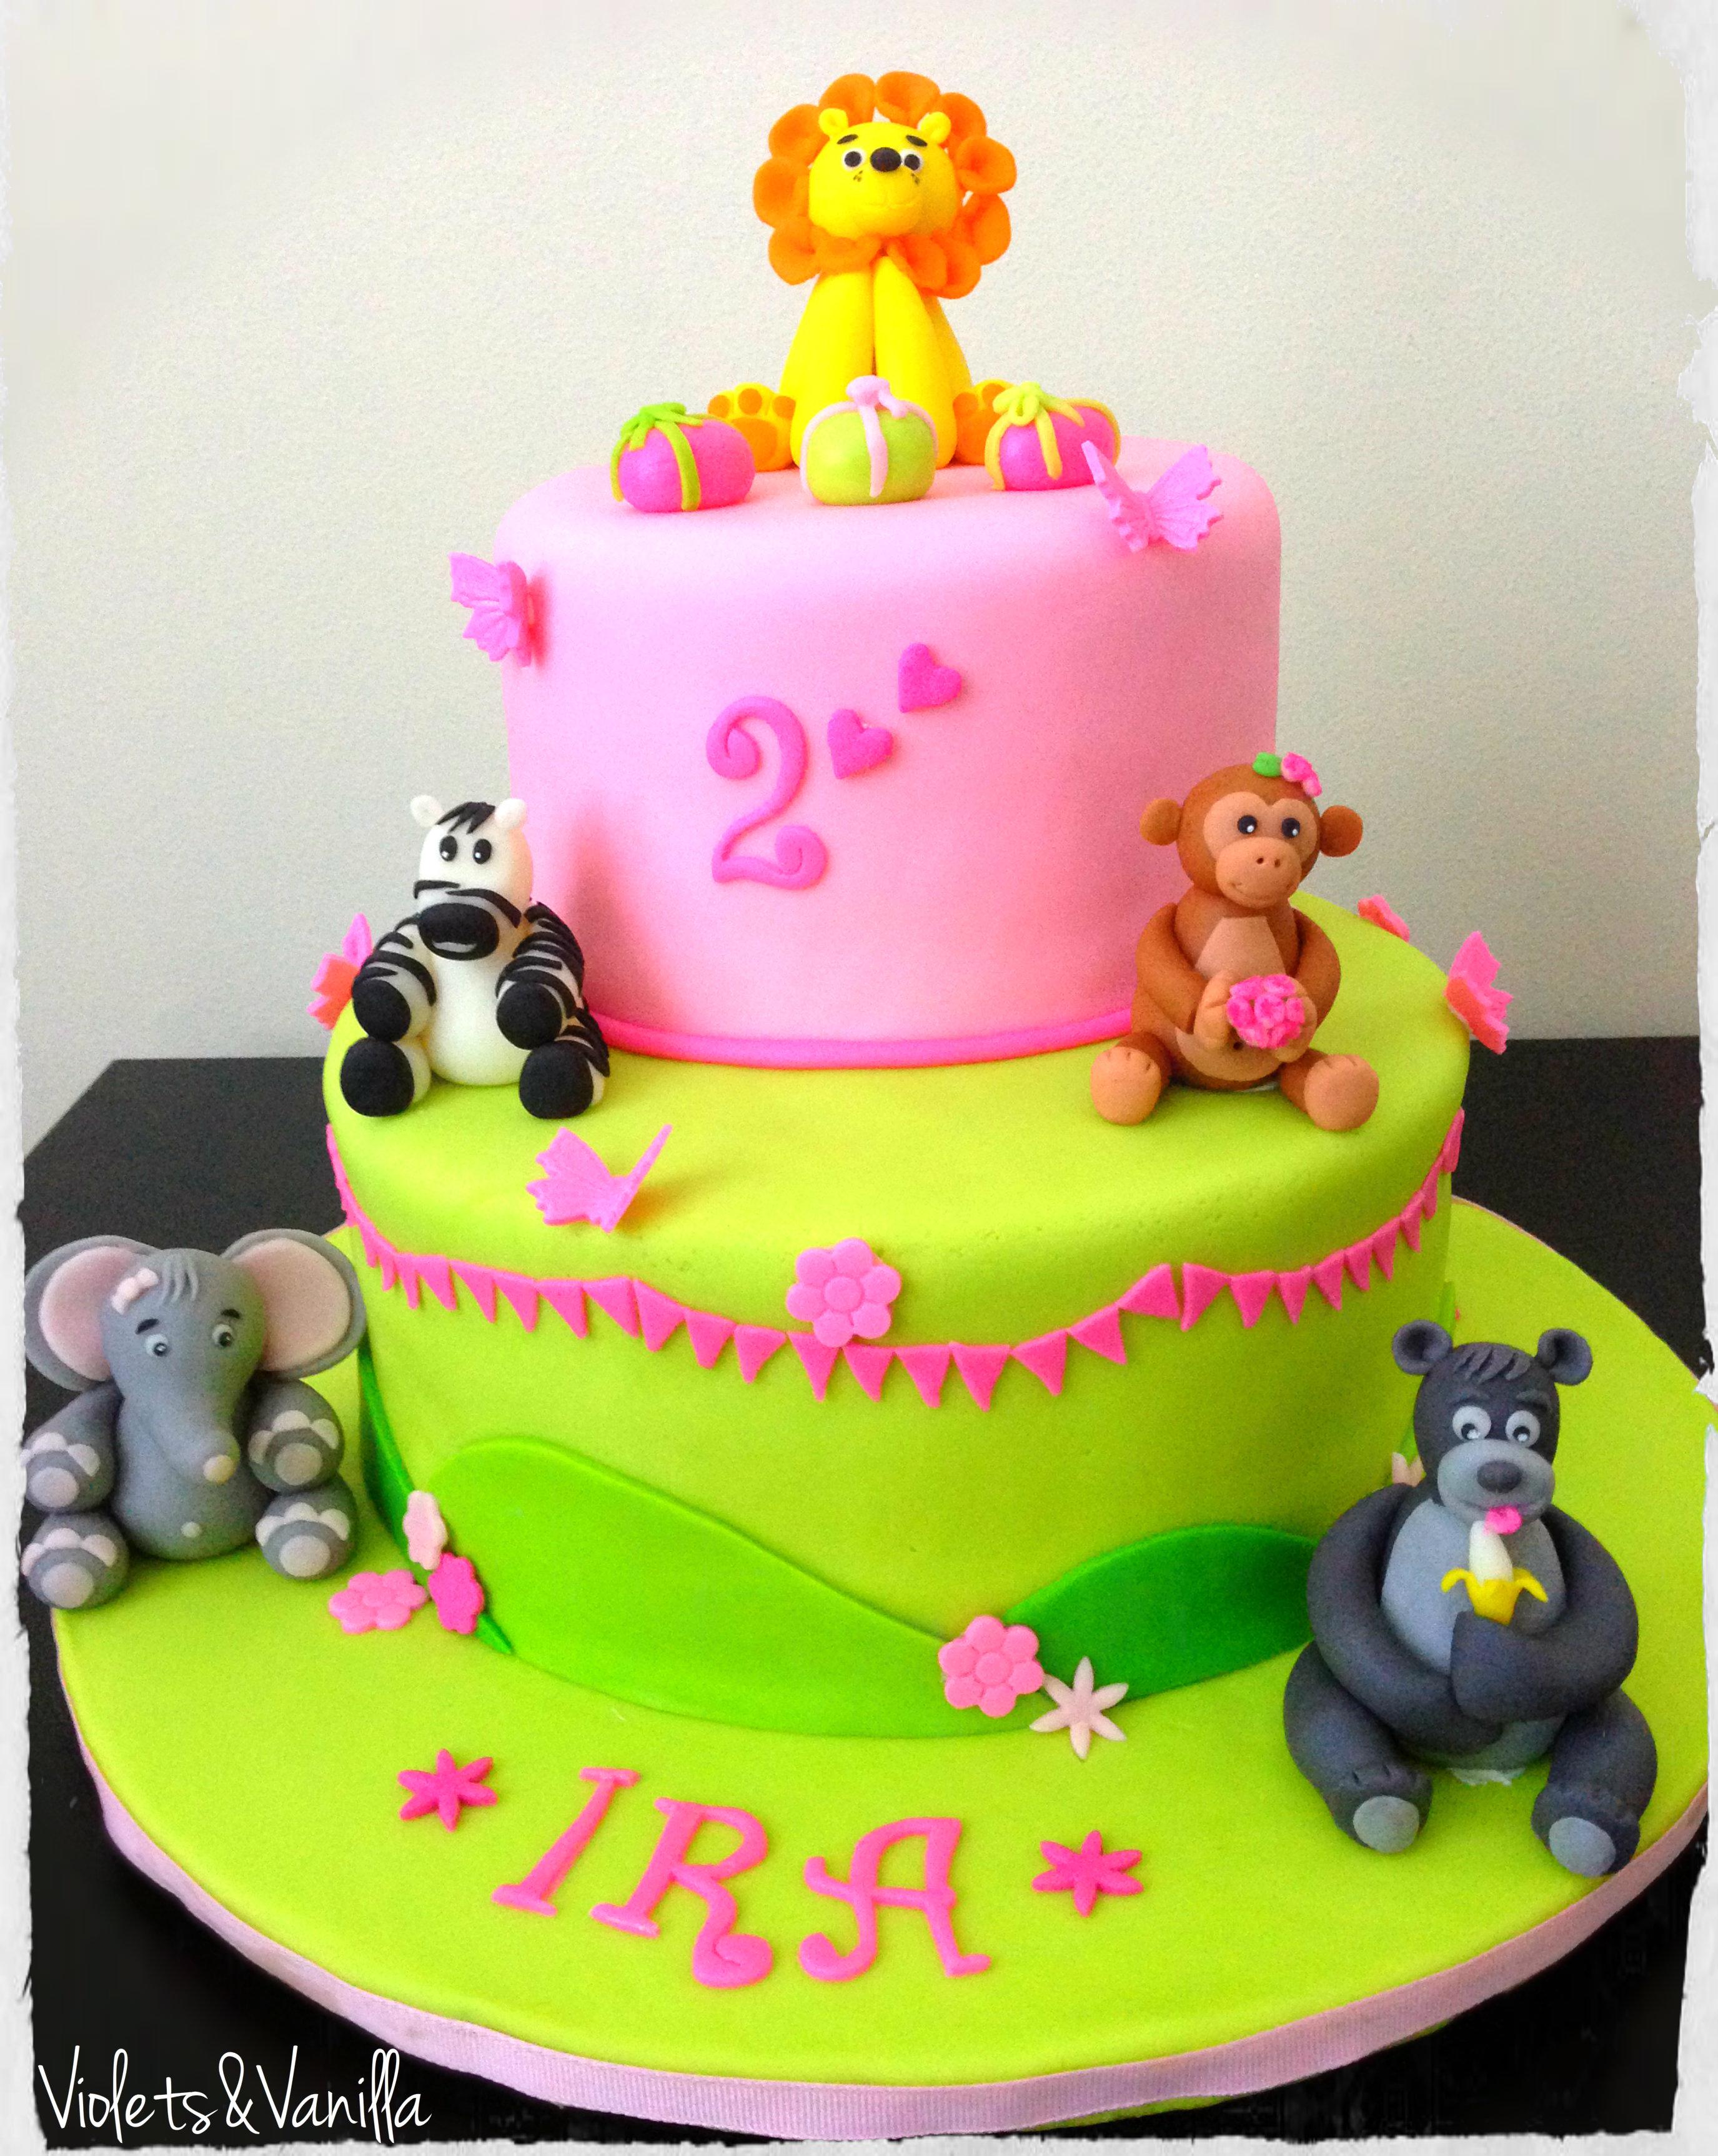 Pink and Green Jungle Animals Cake | Violets & Vanilla